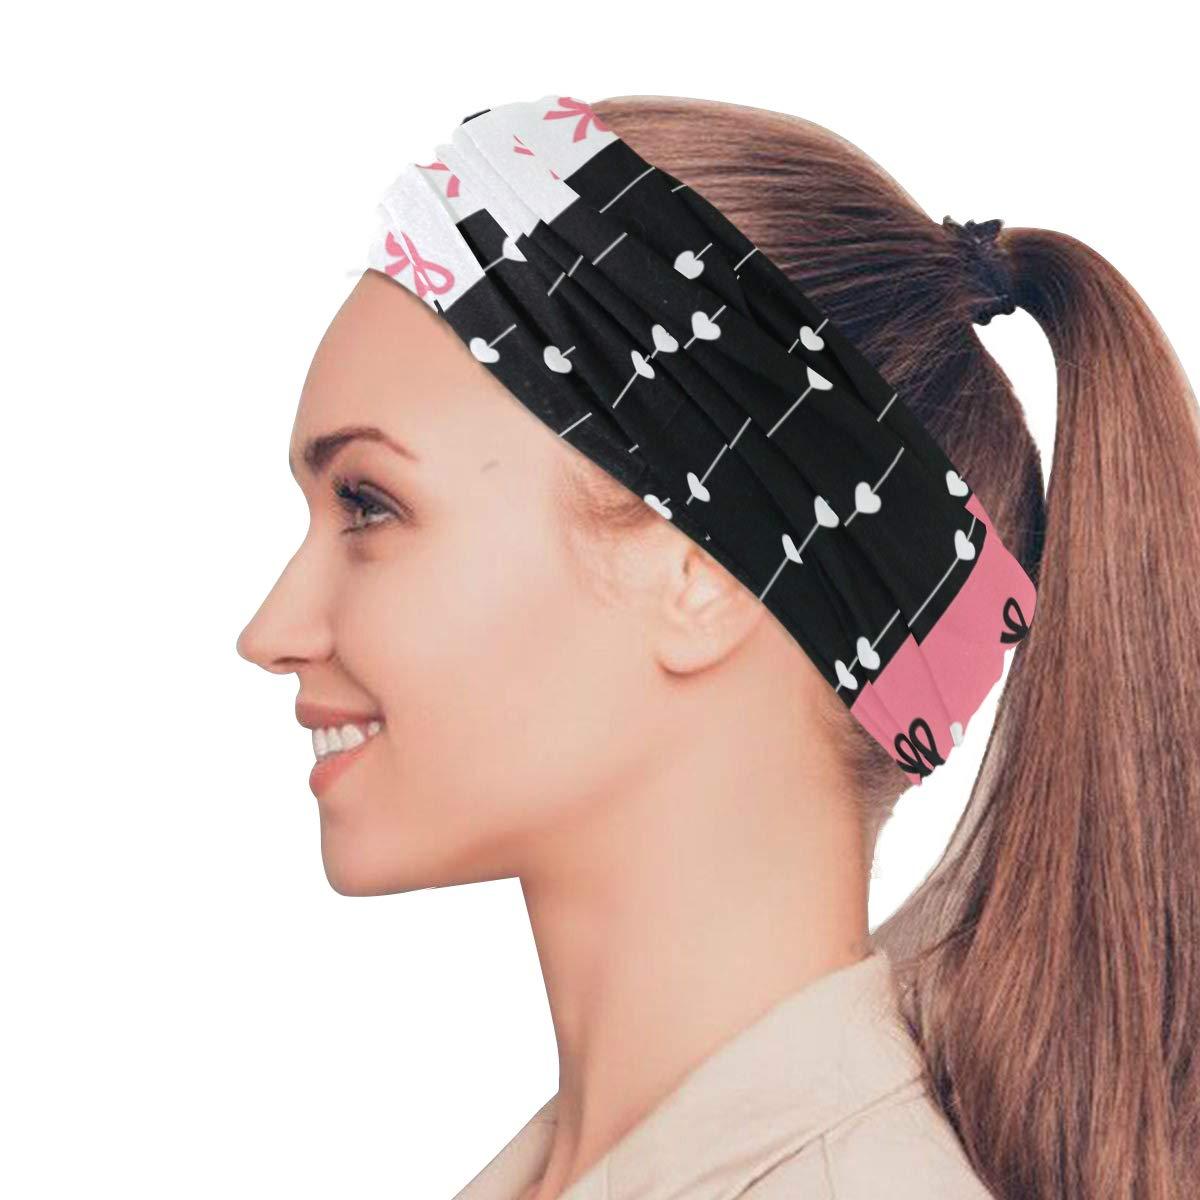 Magic Headwear Lattice Style Outdoor Scarf Headbands Bandana Mask Neck Gaiter Head Wrap Mask Sweatband